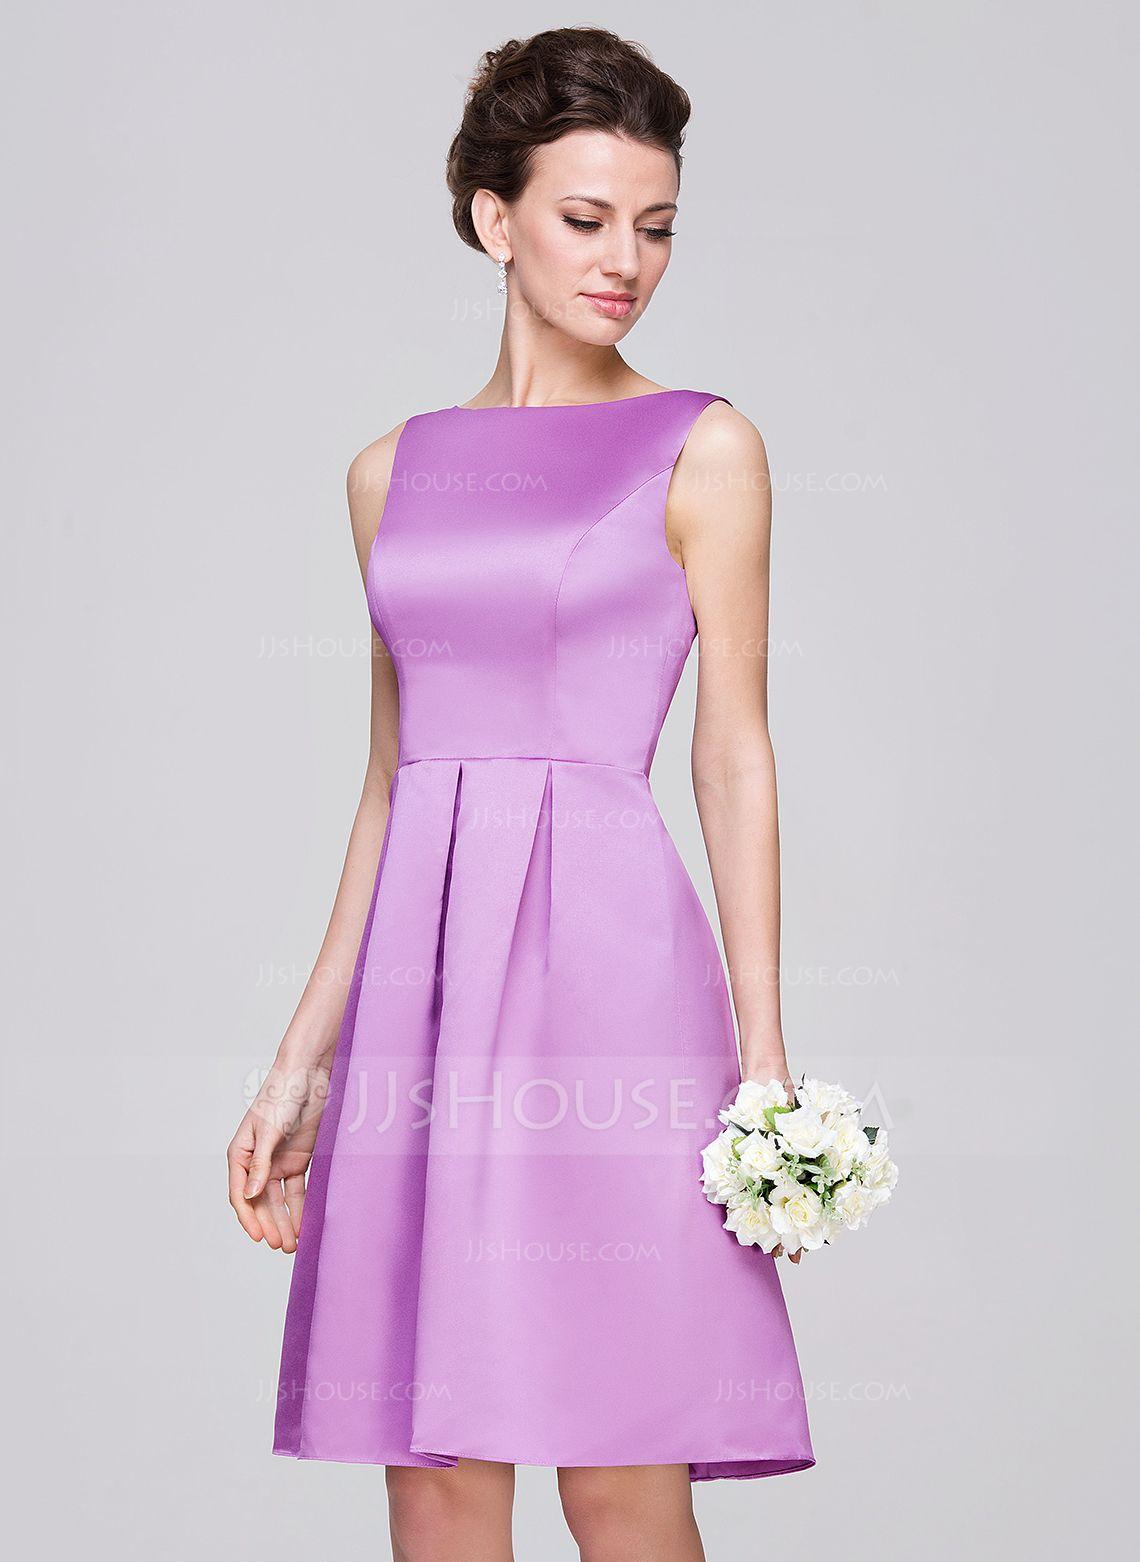 Alineprincess scoop neck kneelength satin bridesmaid dress with